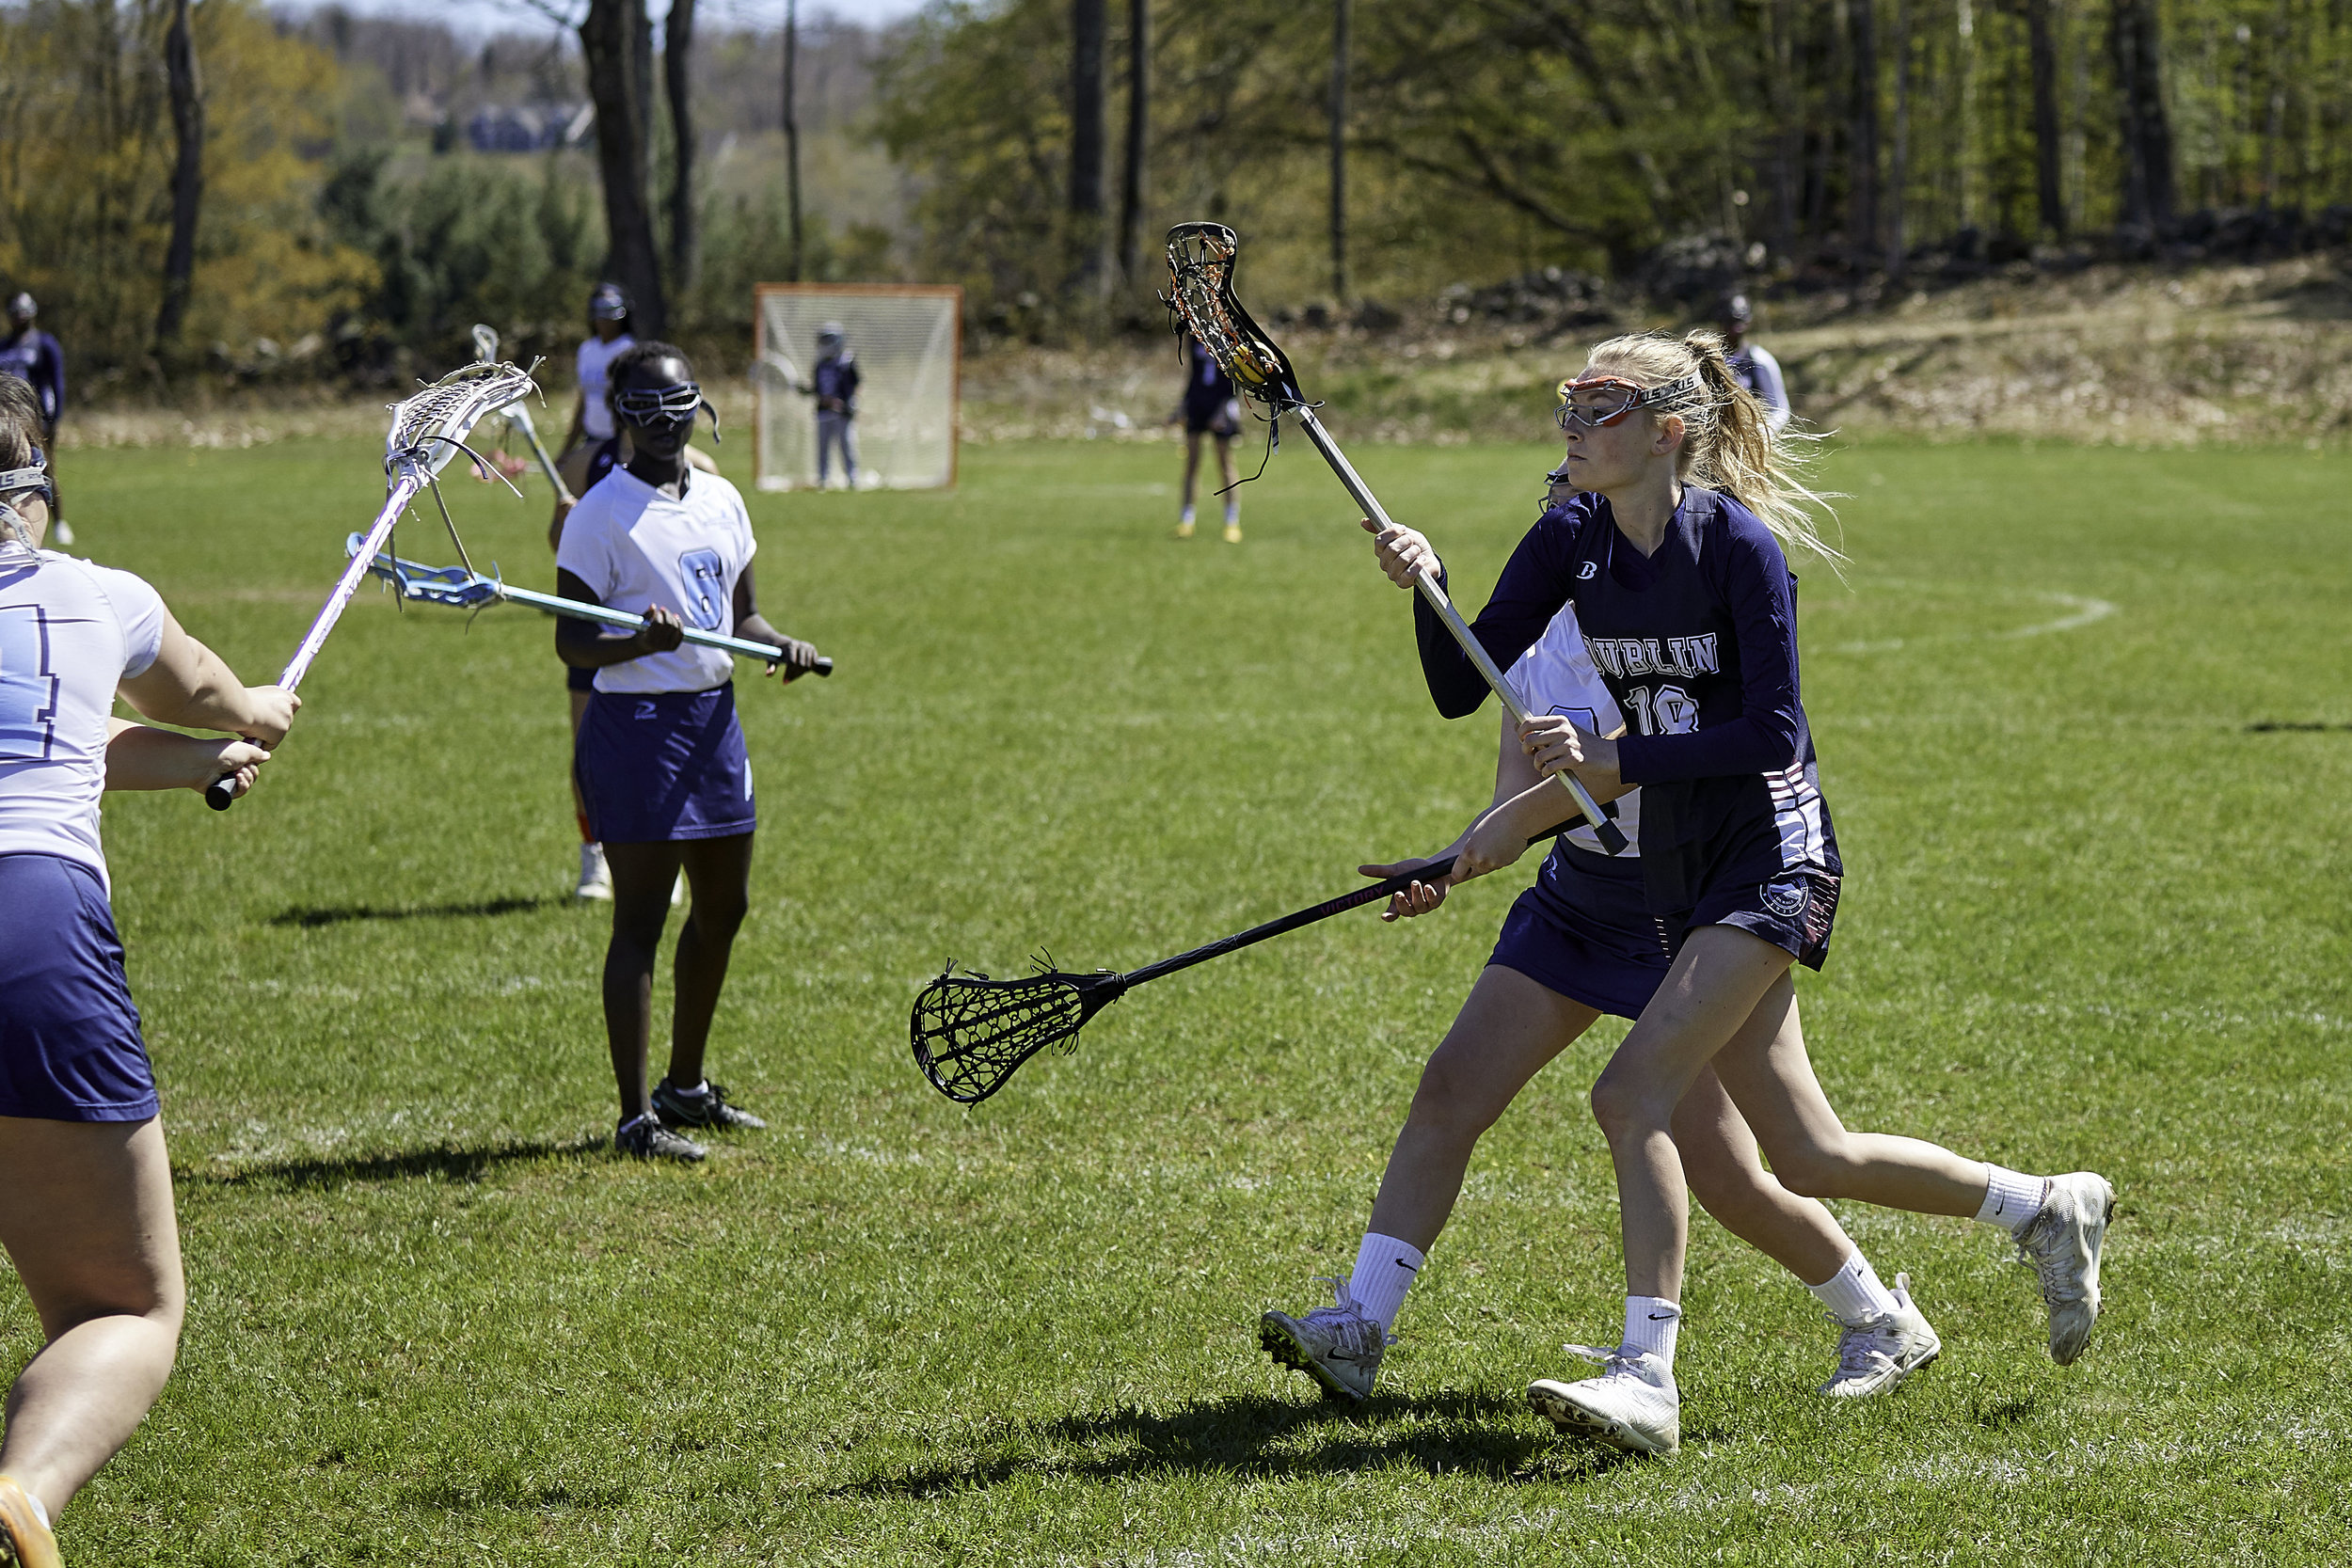 Girls Lacrosse vs. Stoneleigh Burnham School - May 11, 2019 - May 10, 2019193276.jpg